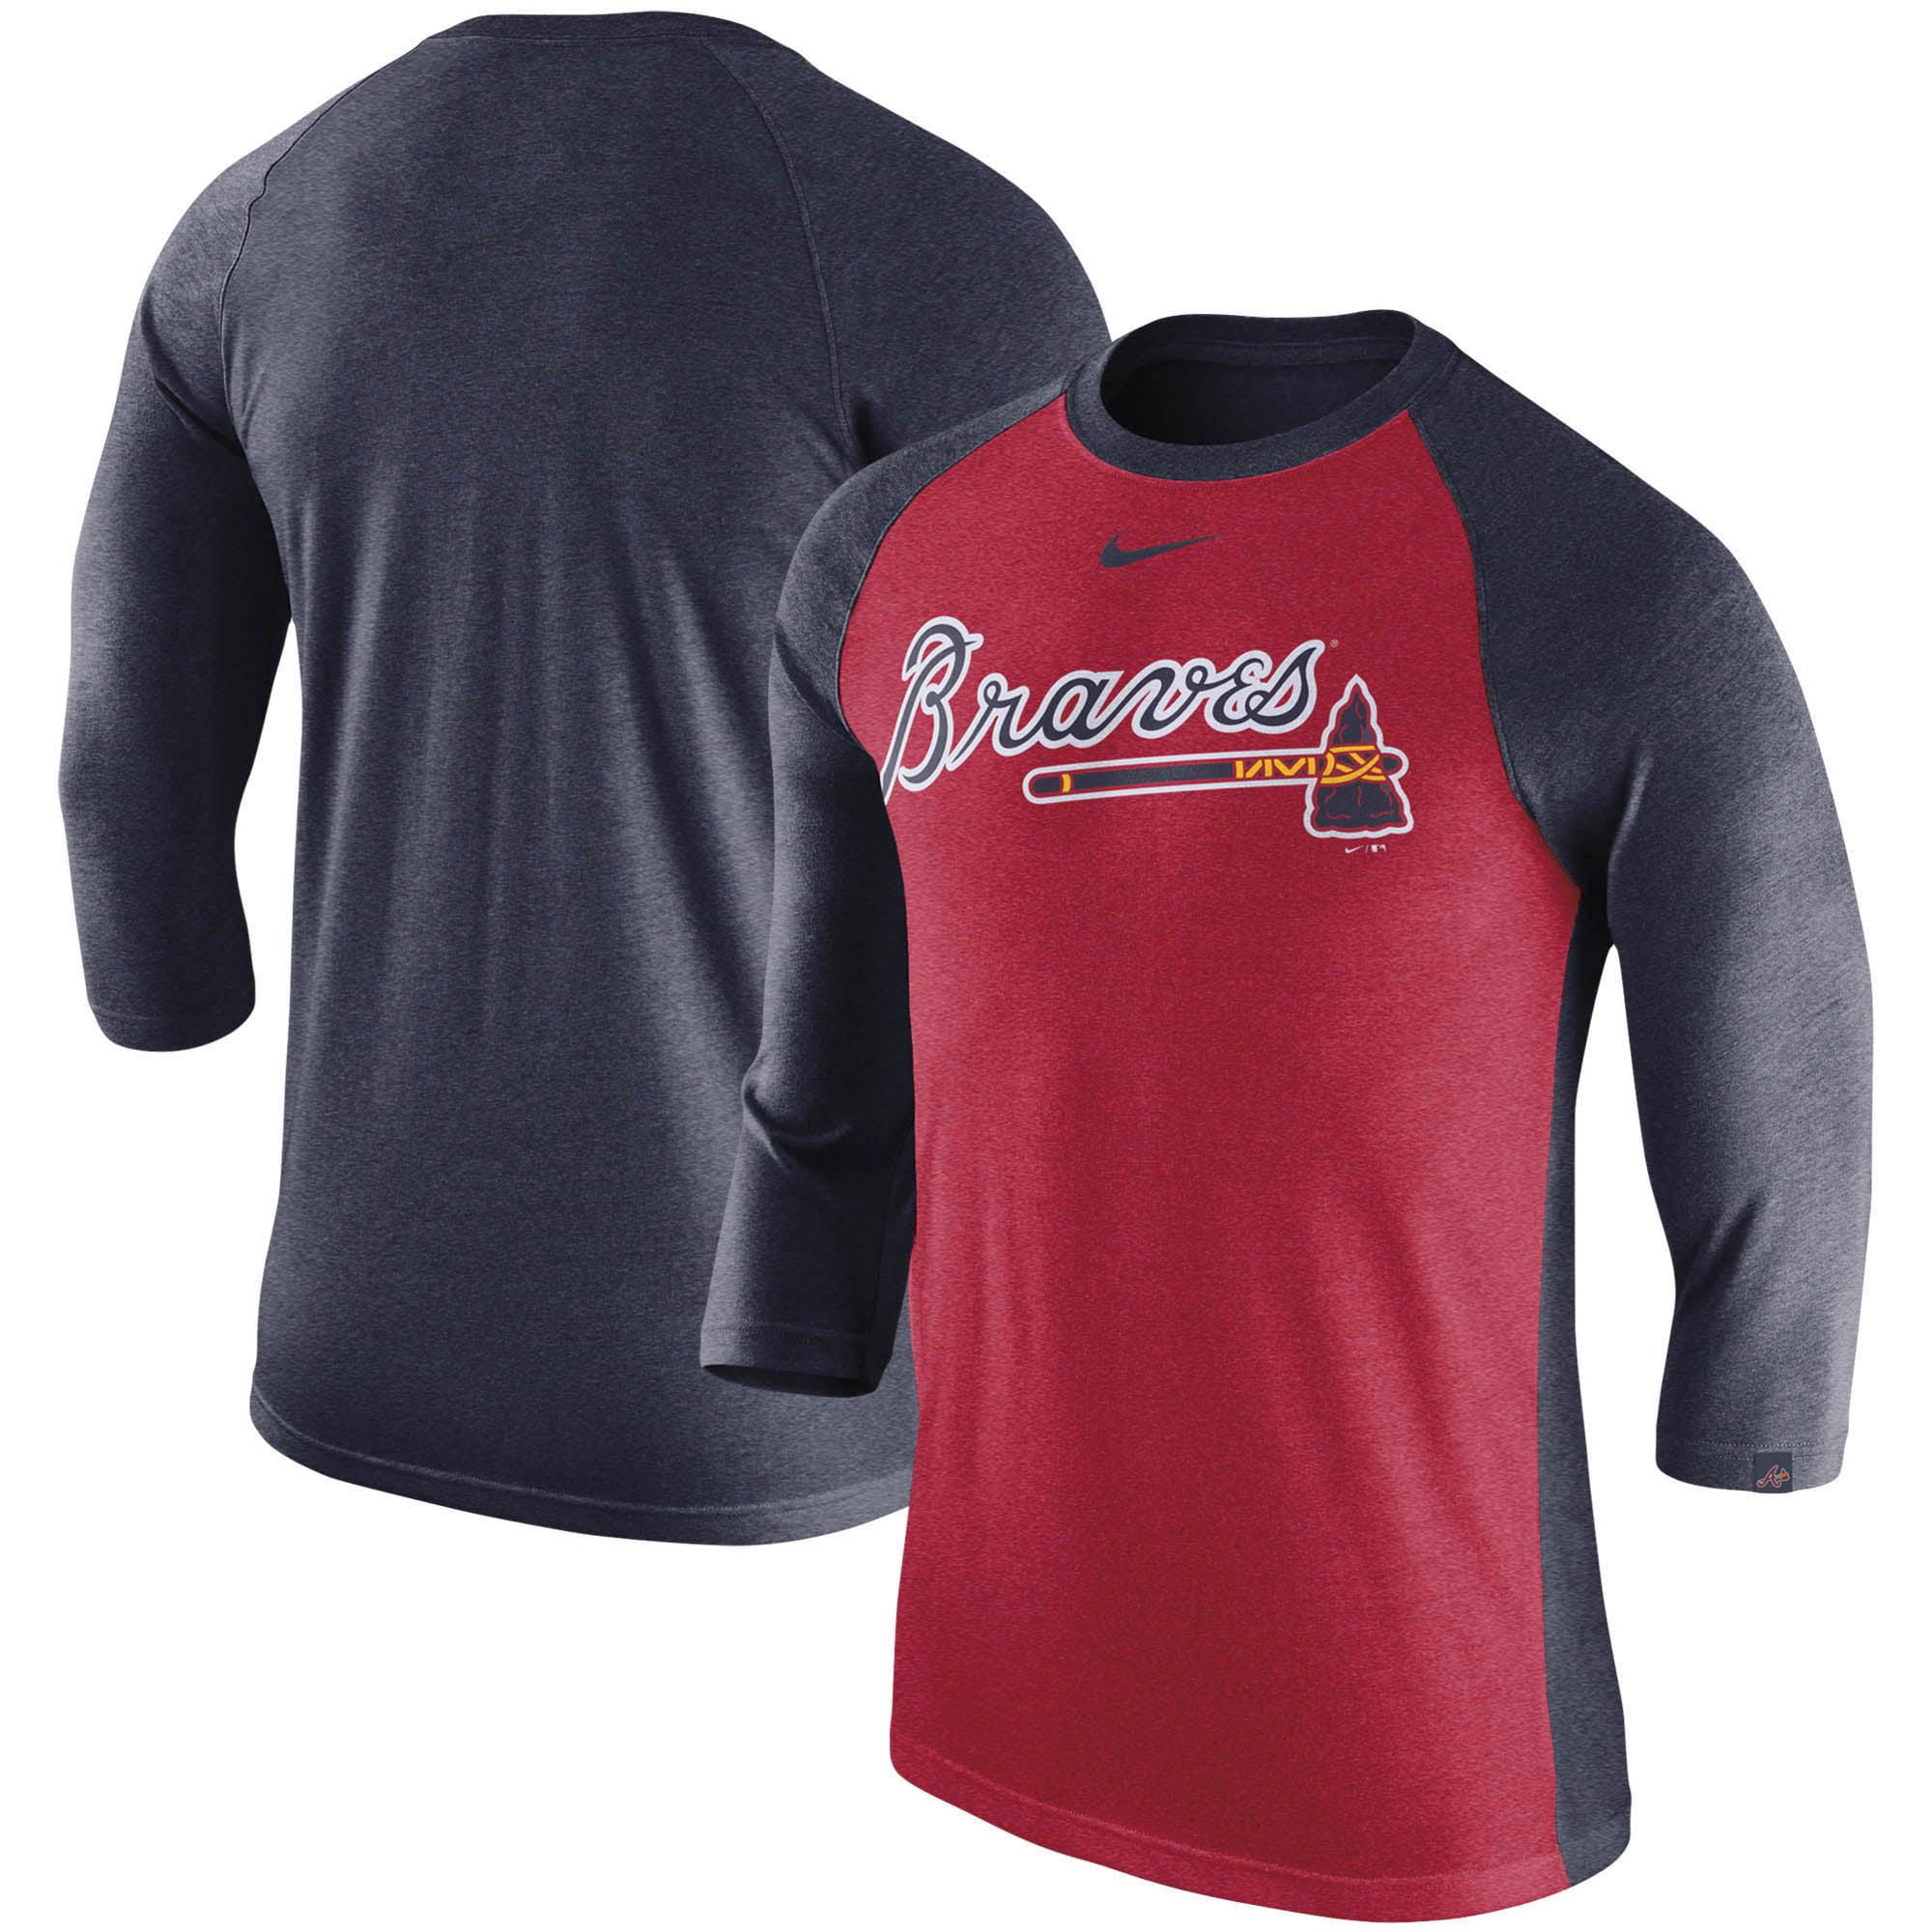 Atlanta Braves Nike 3/4-Sleeve Tri-Blend Raglan T-Shirt - Heathered Red